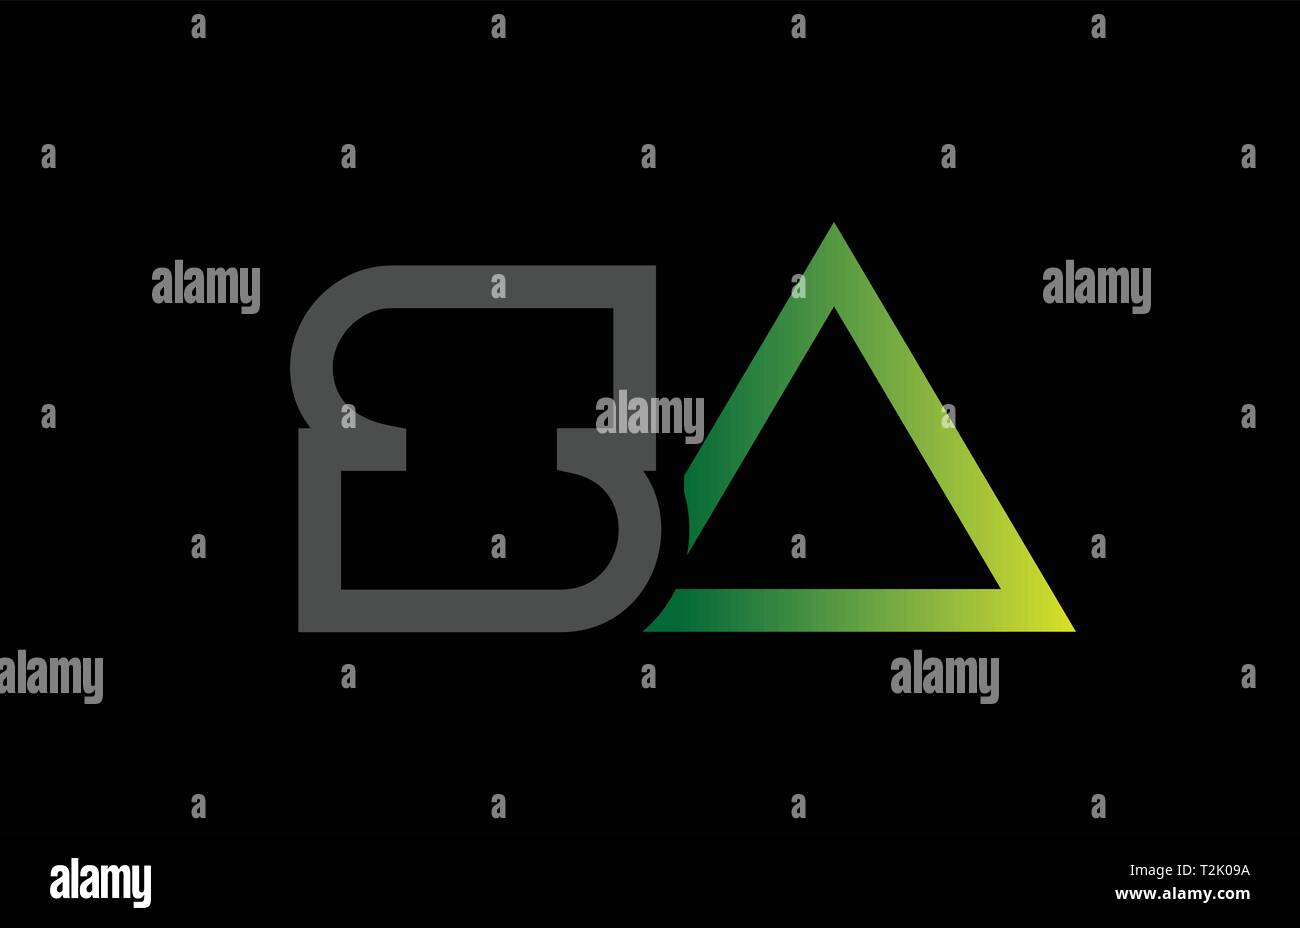 green black grey alphabet letter logo combination sa s a design suitable for a company or business - Stock Vector